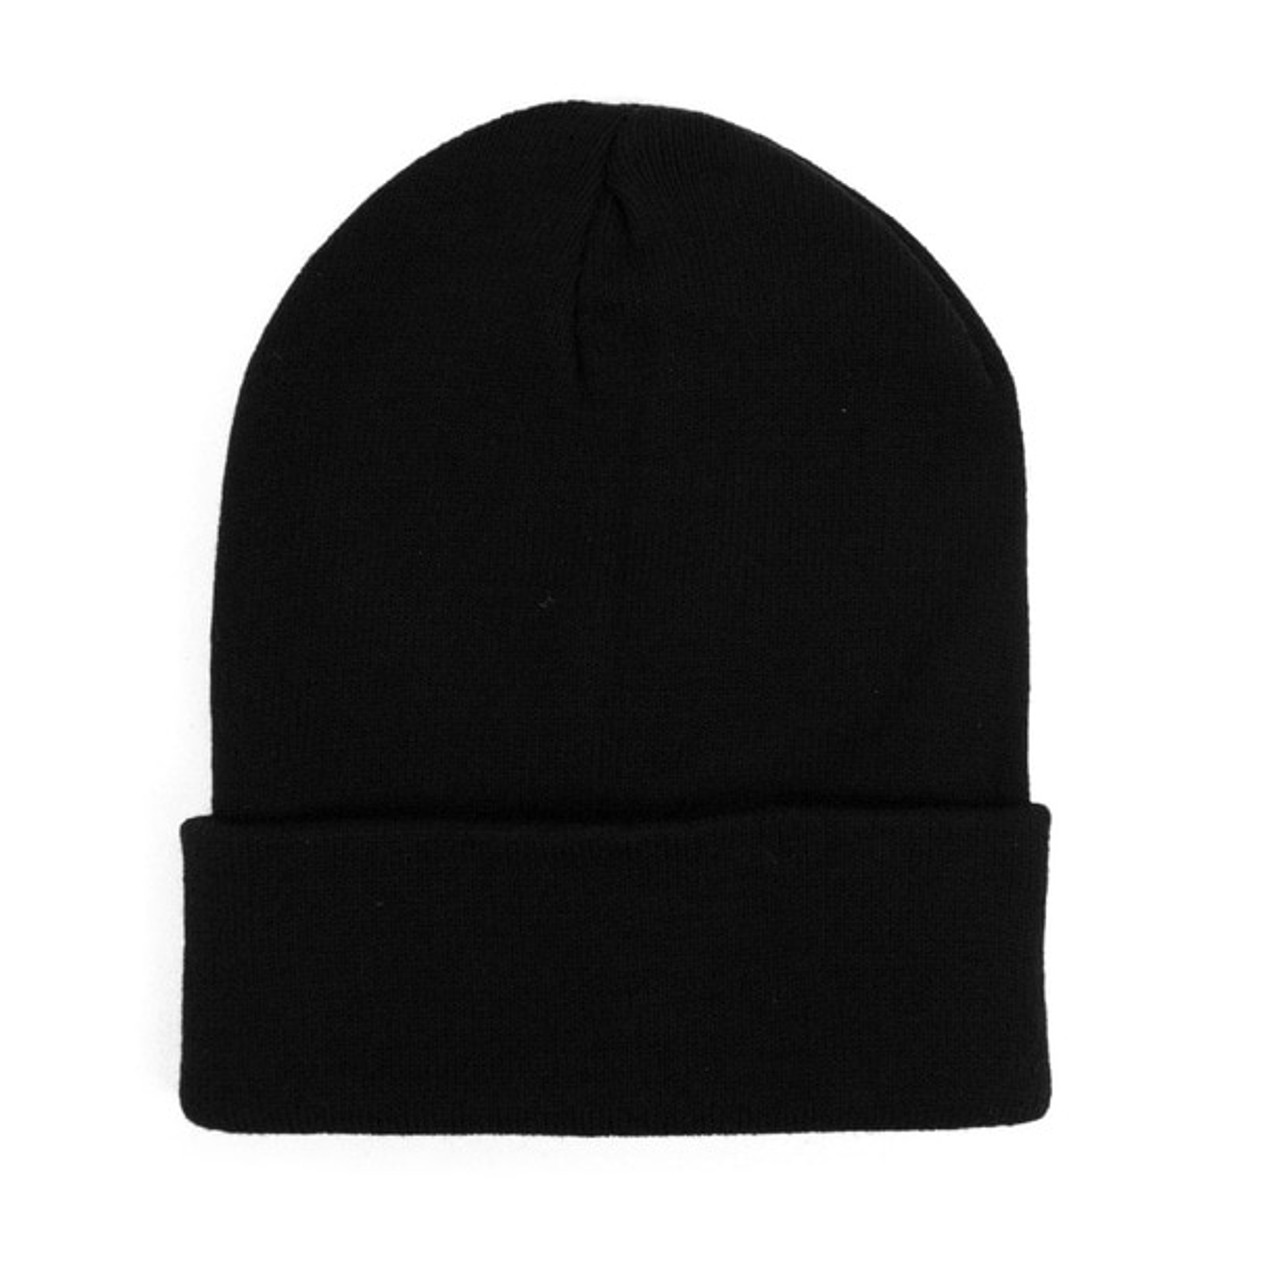 7e6c55758c7 3-Pack Thermal Windproof Winter Black Beanie Hat - Tanga